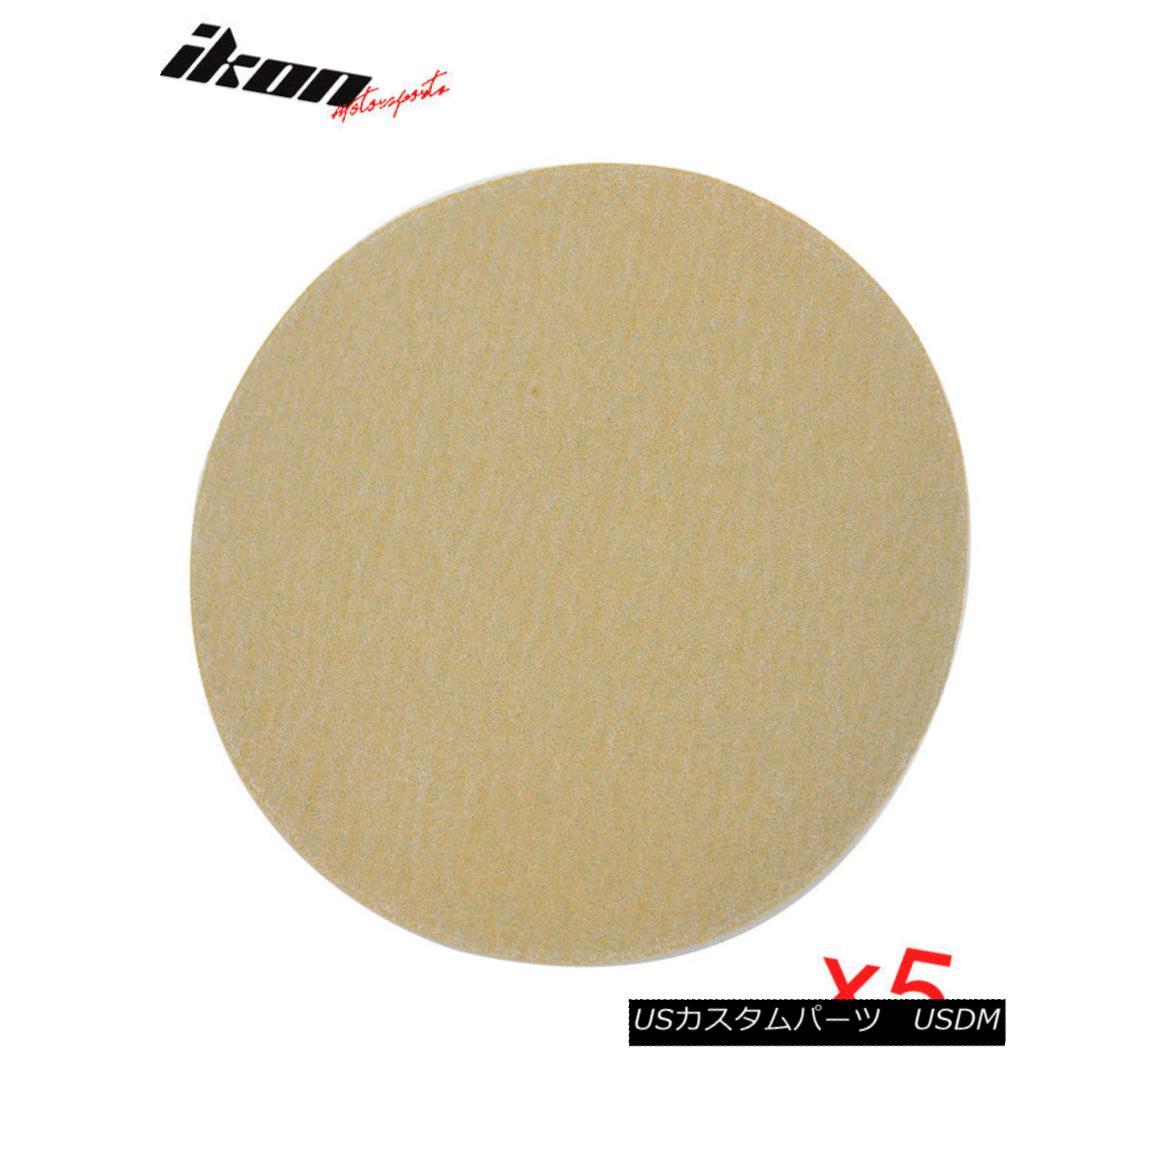 Car 150 Sheets Paper Grit 5 PSAオートカーサンディングペーパーシート修理サンドペーパーベルクロ50PC Repair Sandpaper Sanding ディスク150グリット5 50PC Auto エアロパーツ Velcro PSA Disc